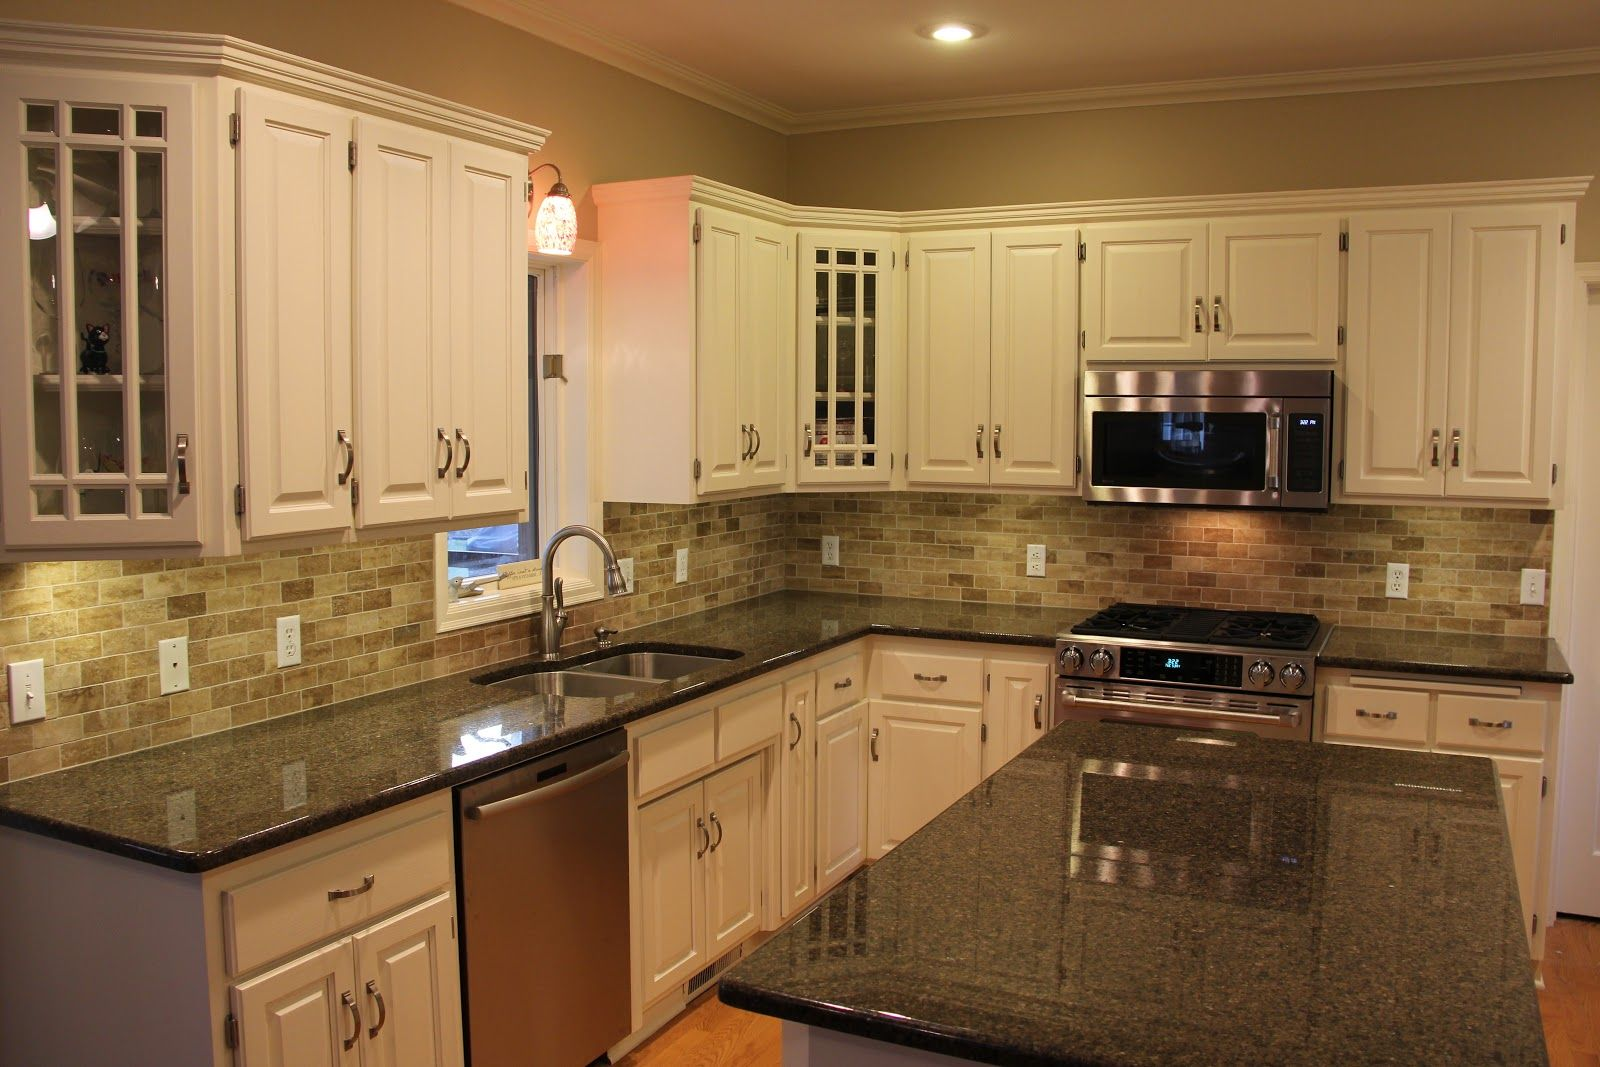 Black kitchen granite countertops with tile backsplash and